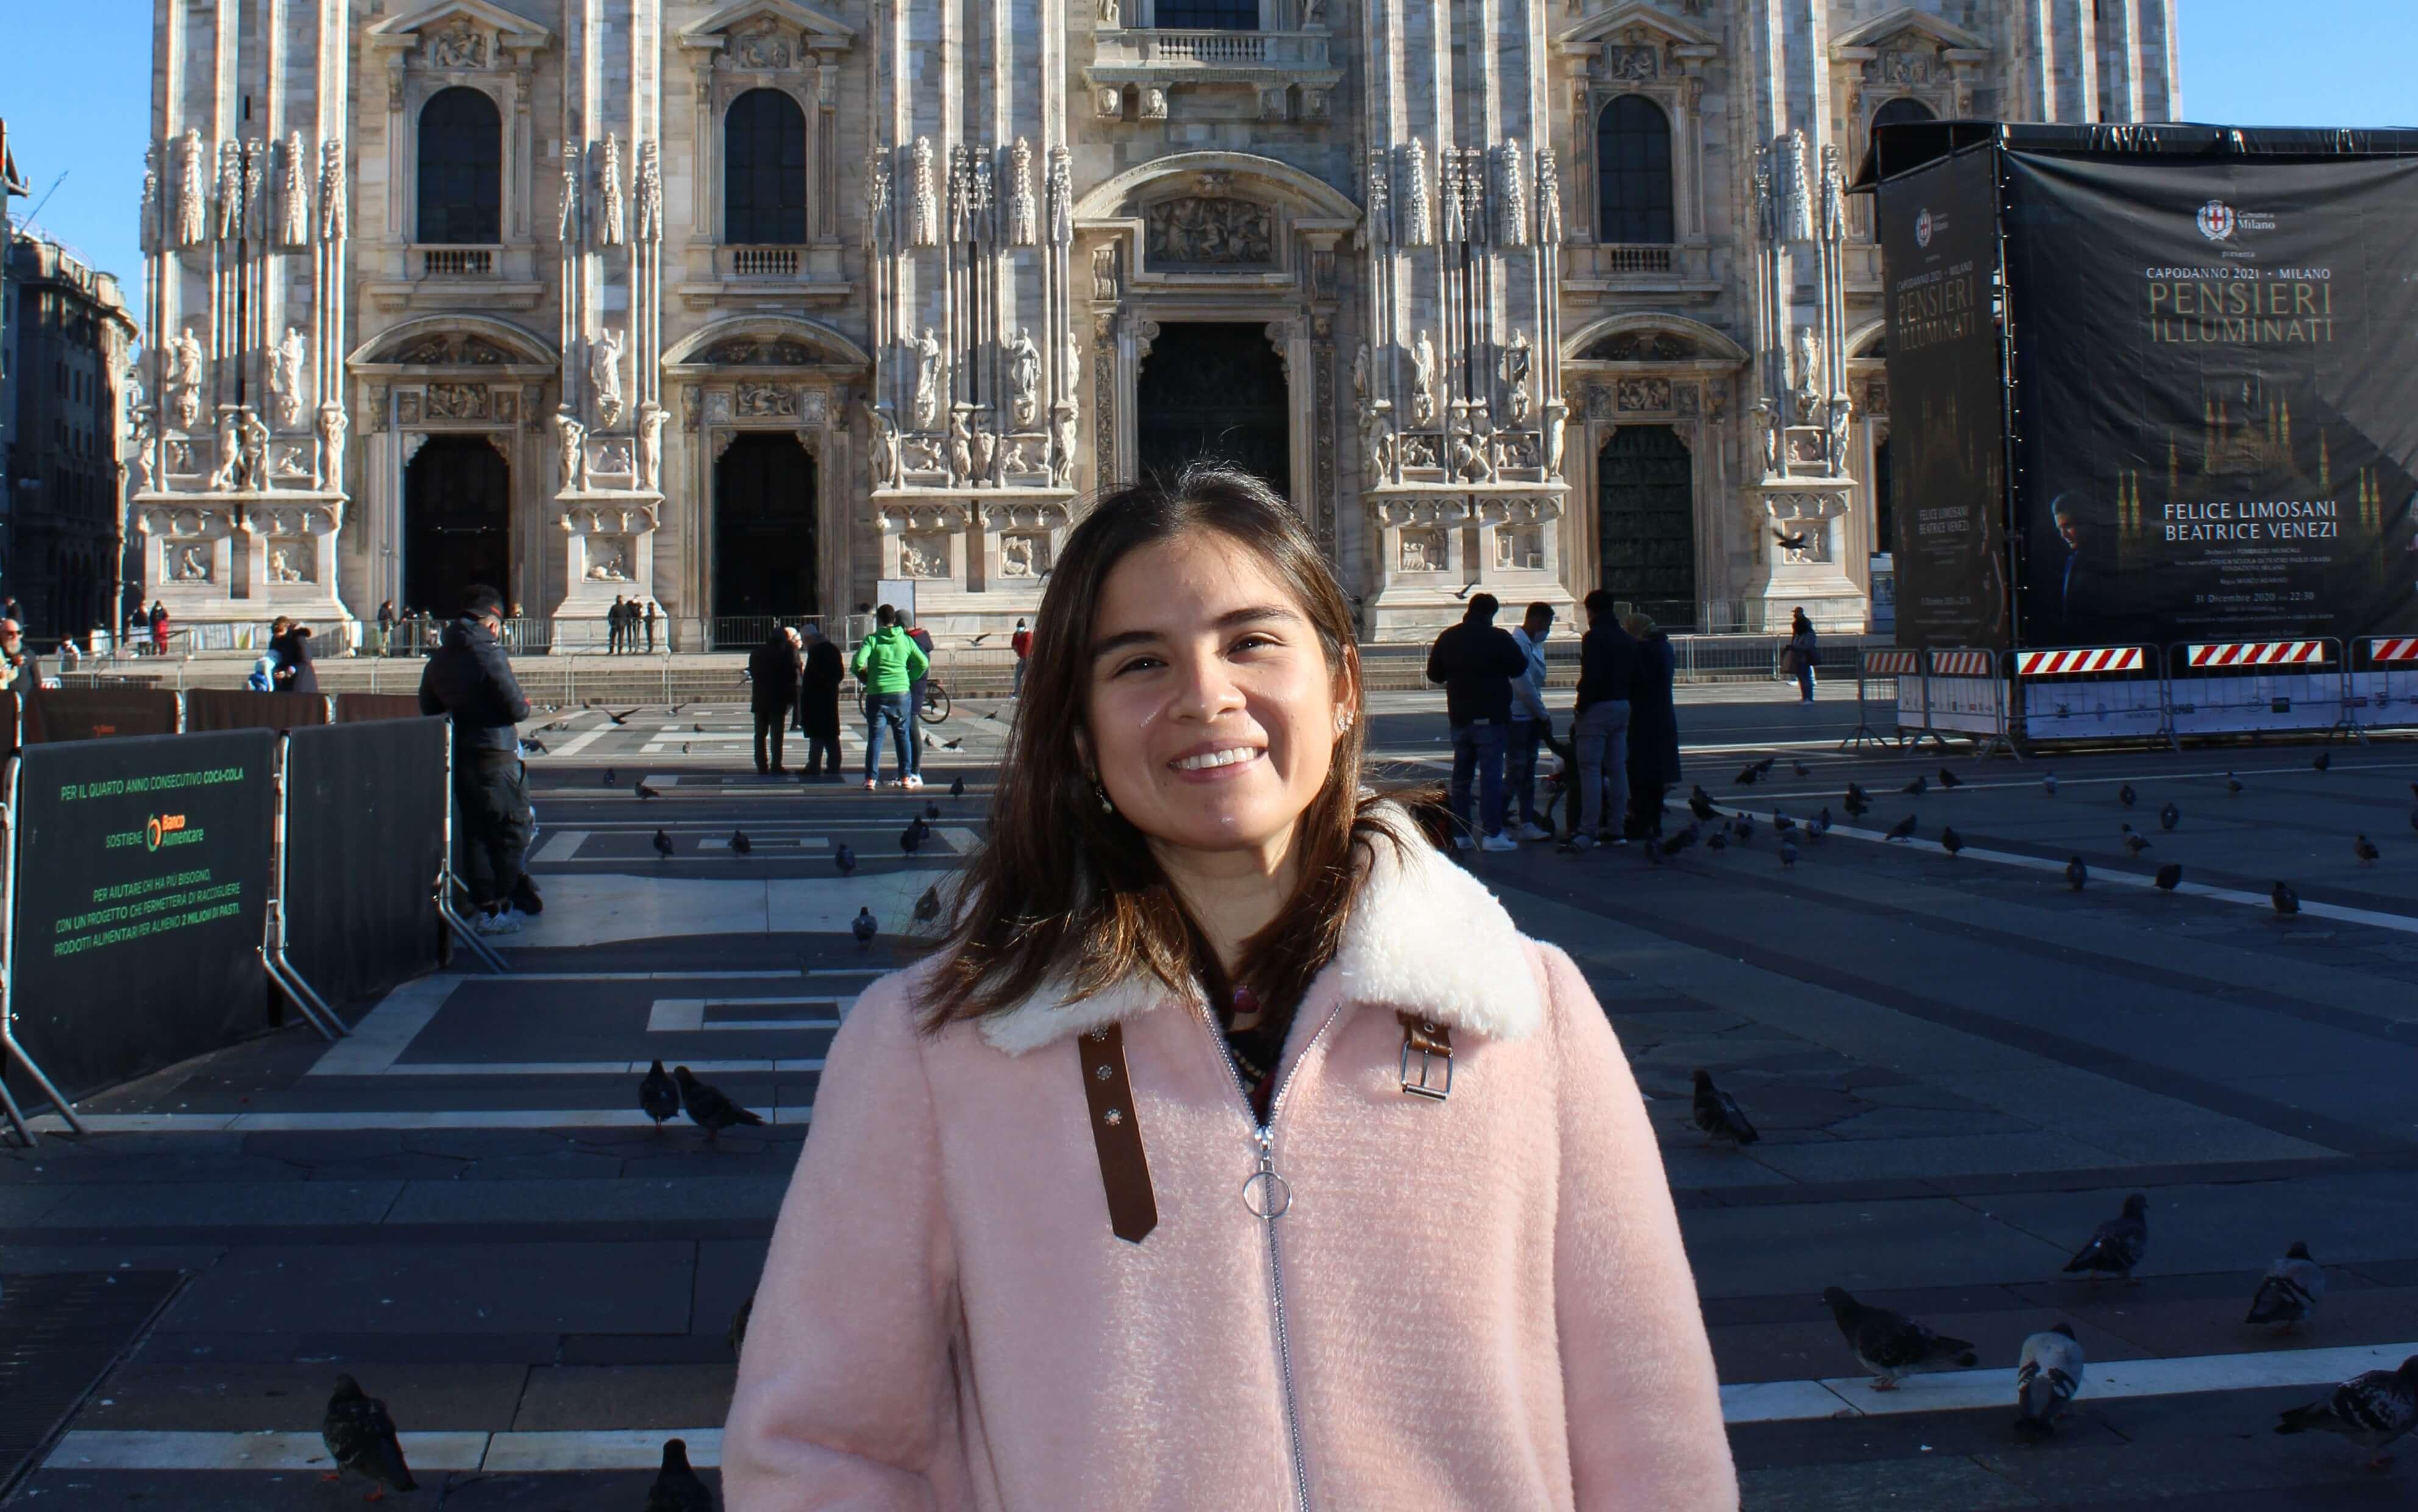 The Peruvian who won an MBA scholarship to Italy